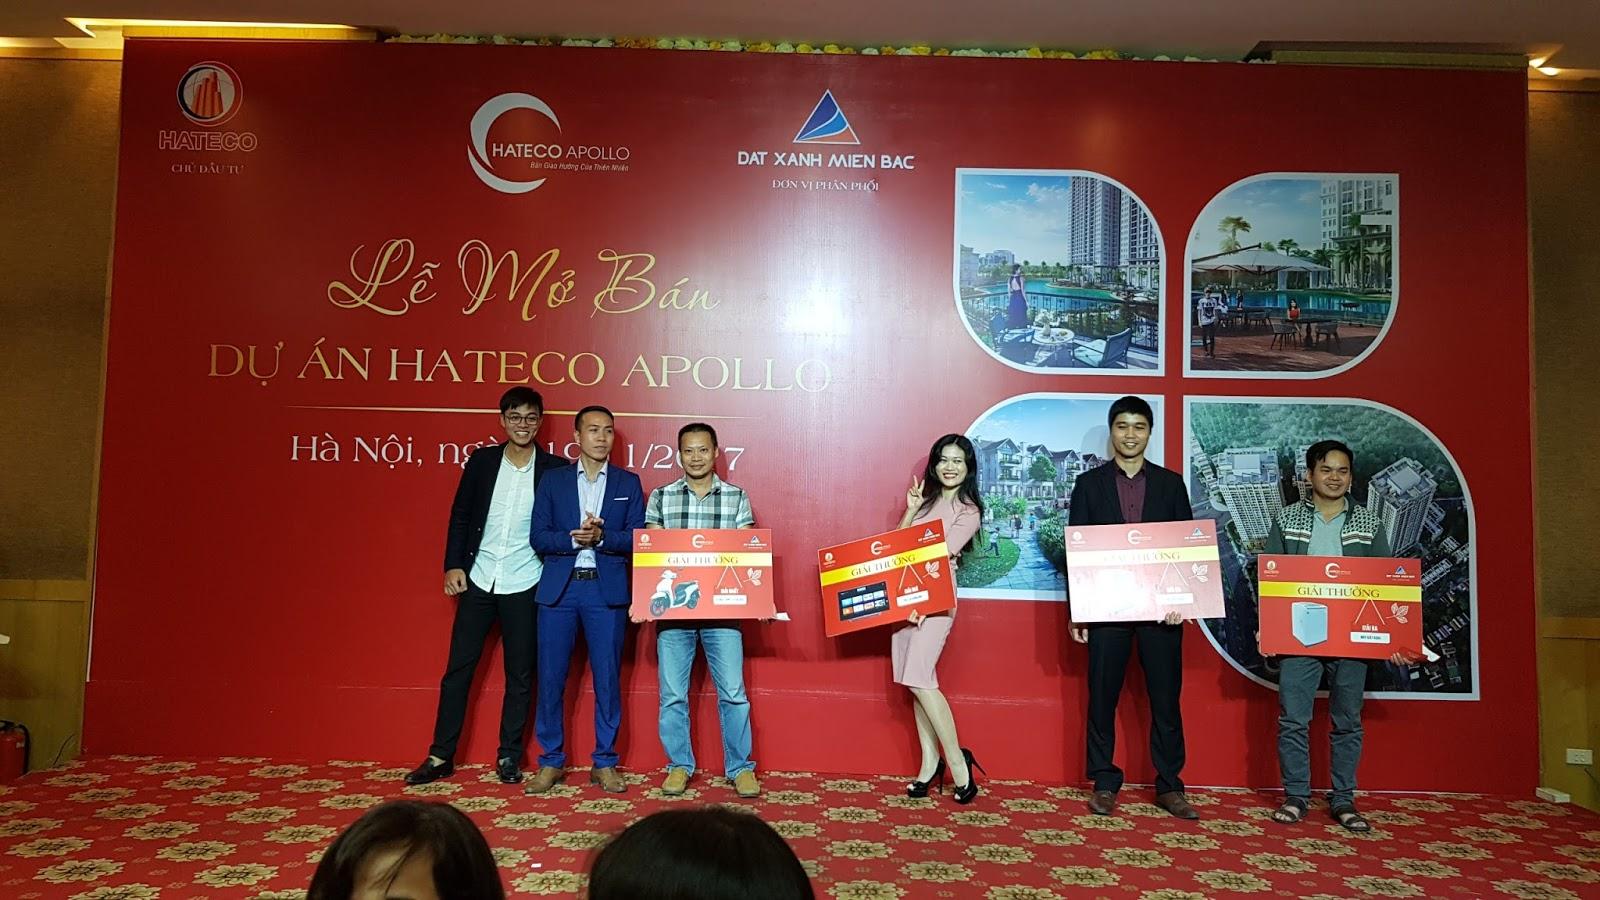 Phần trao giải trong sự kiện mở bán Hateco Apollo Xuân Phương